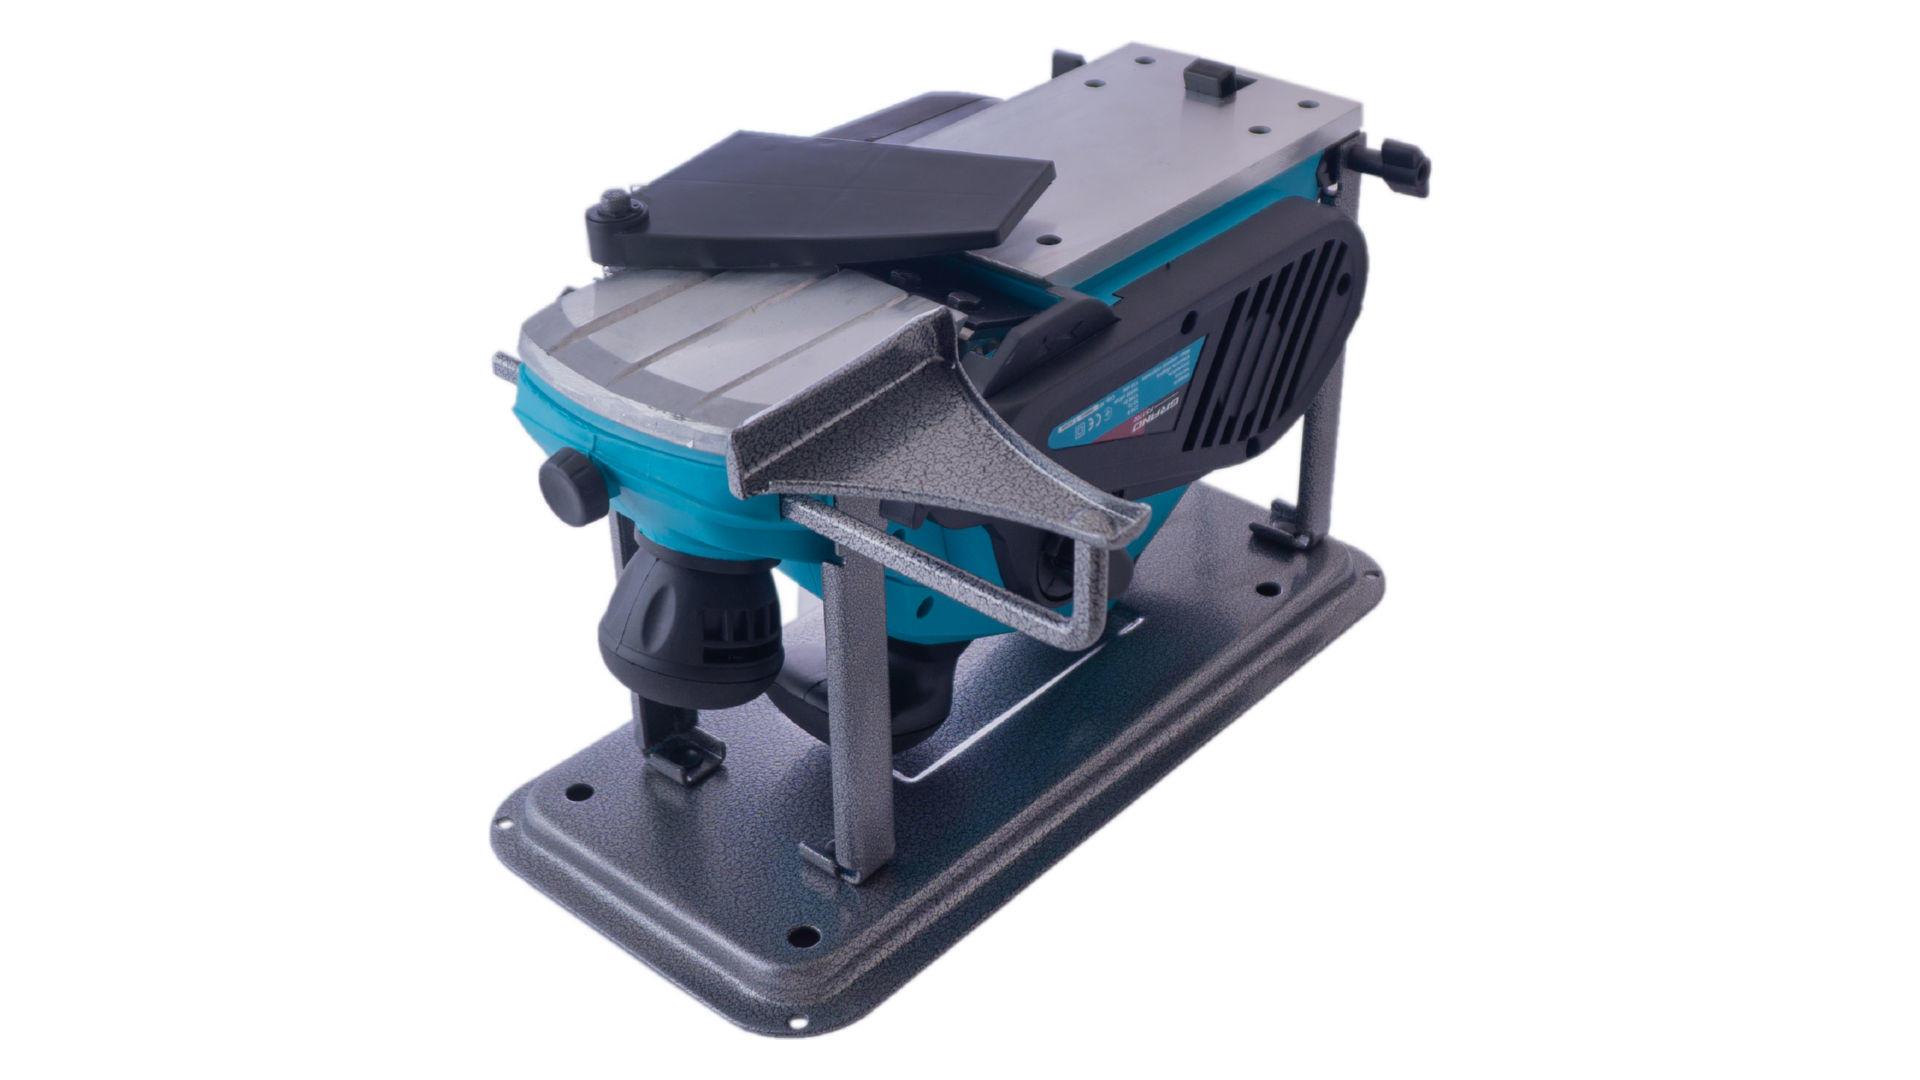 Рубанок Grand РЭ-1700 Pro 6